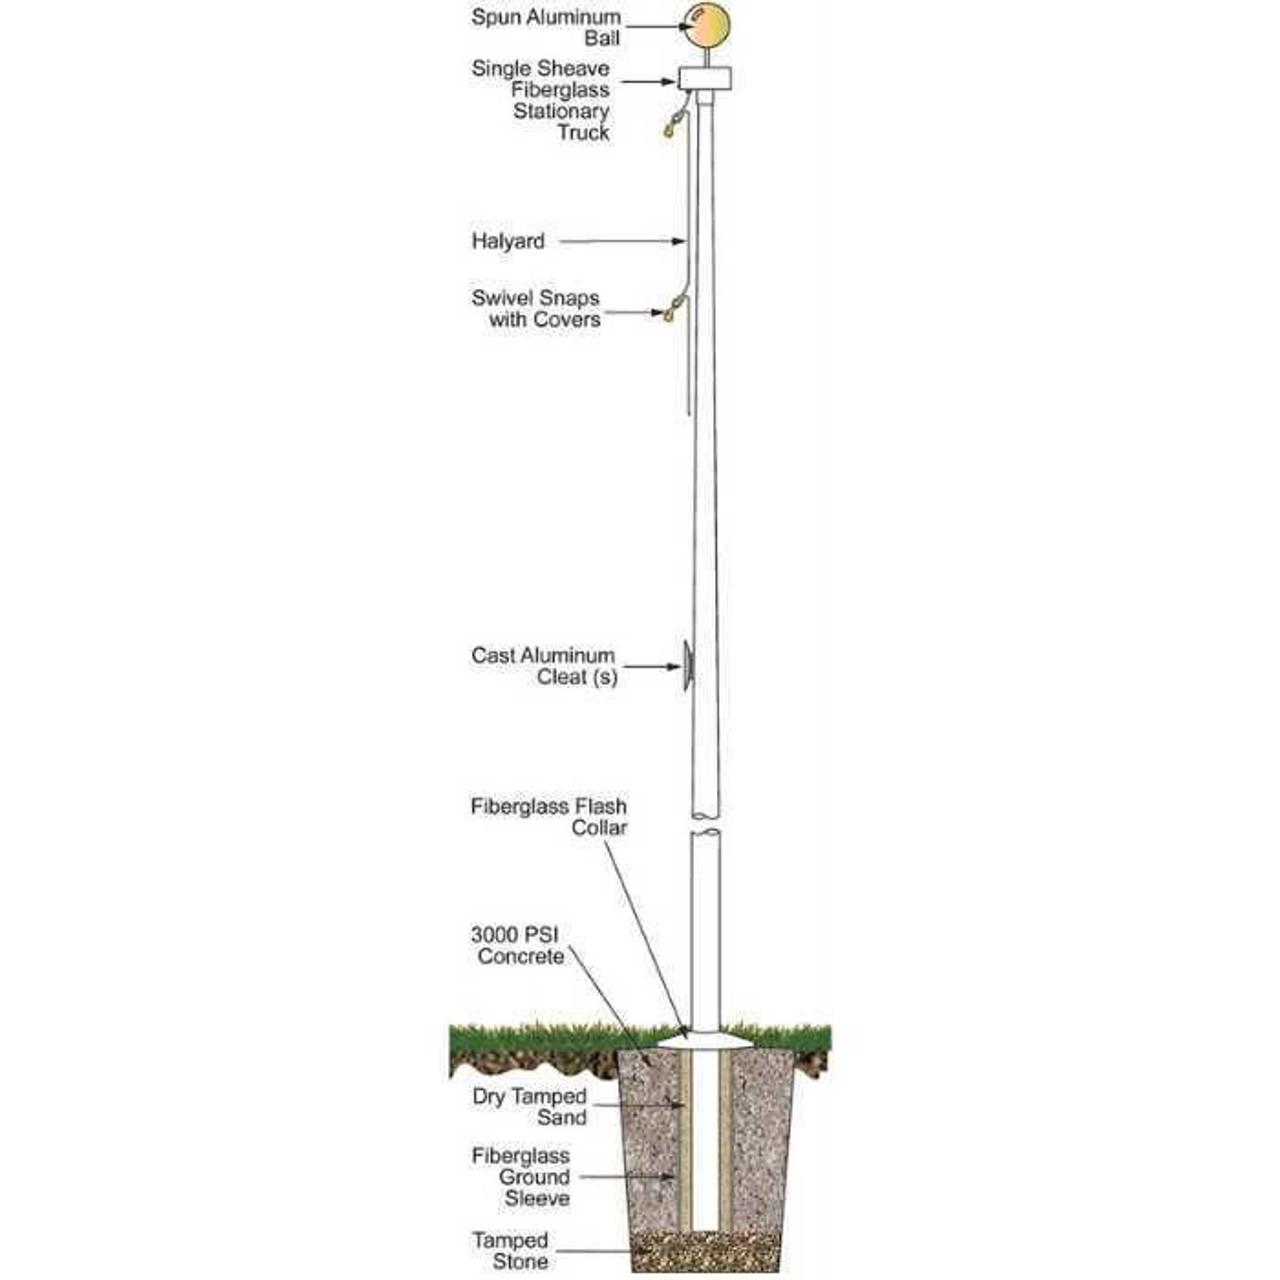 25 Fiberglass External Halyard Flagpole w/ Collar FGR25